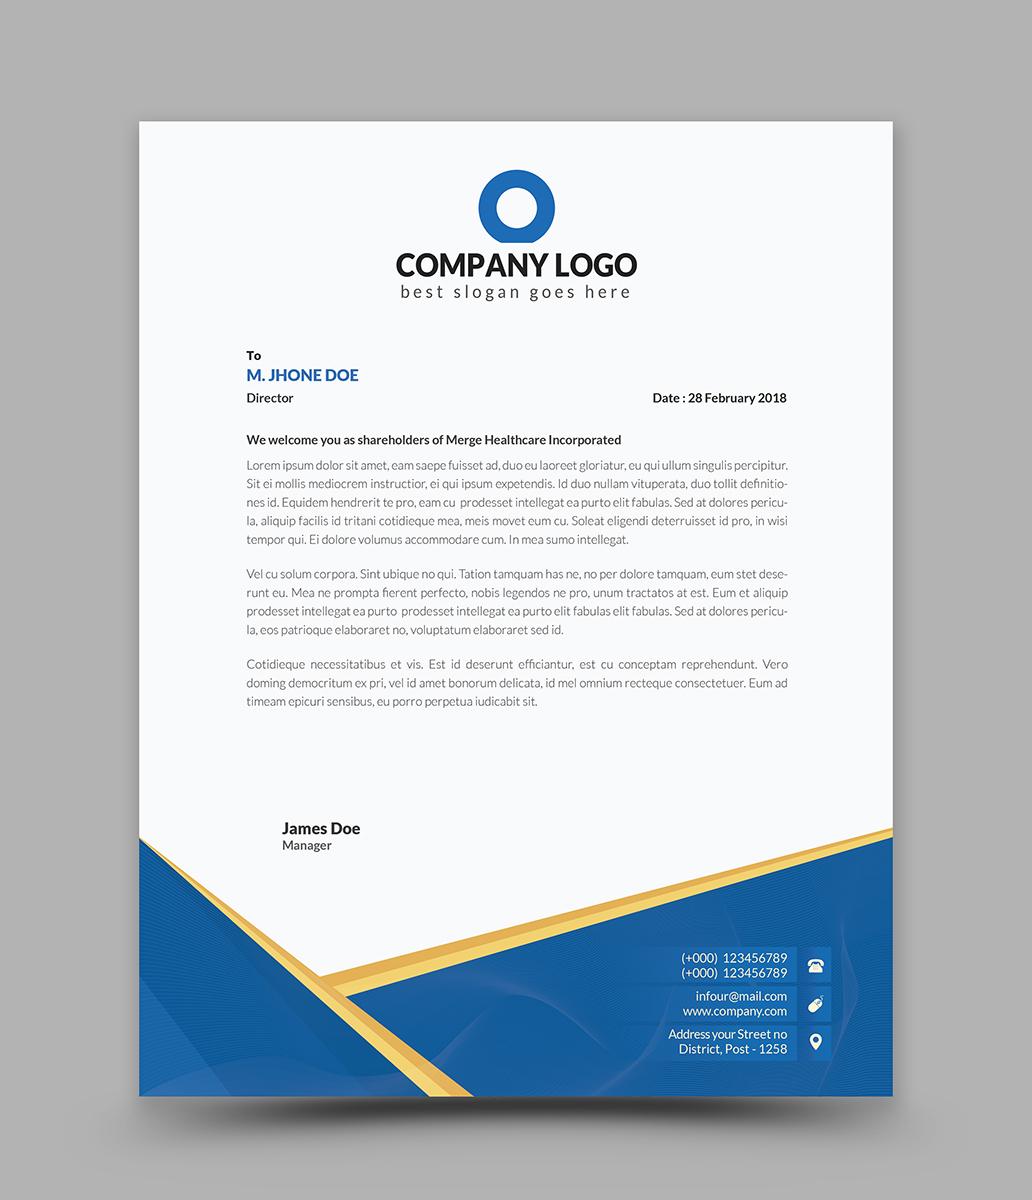 Eps Corporate Letterhead Template 000105: Curves Creative Letterhead